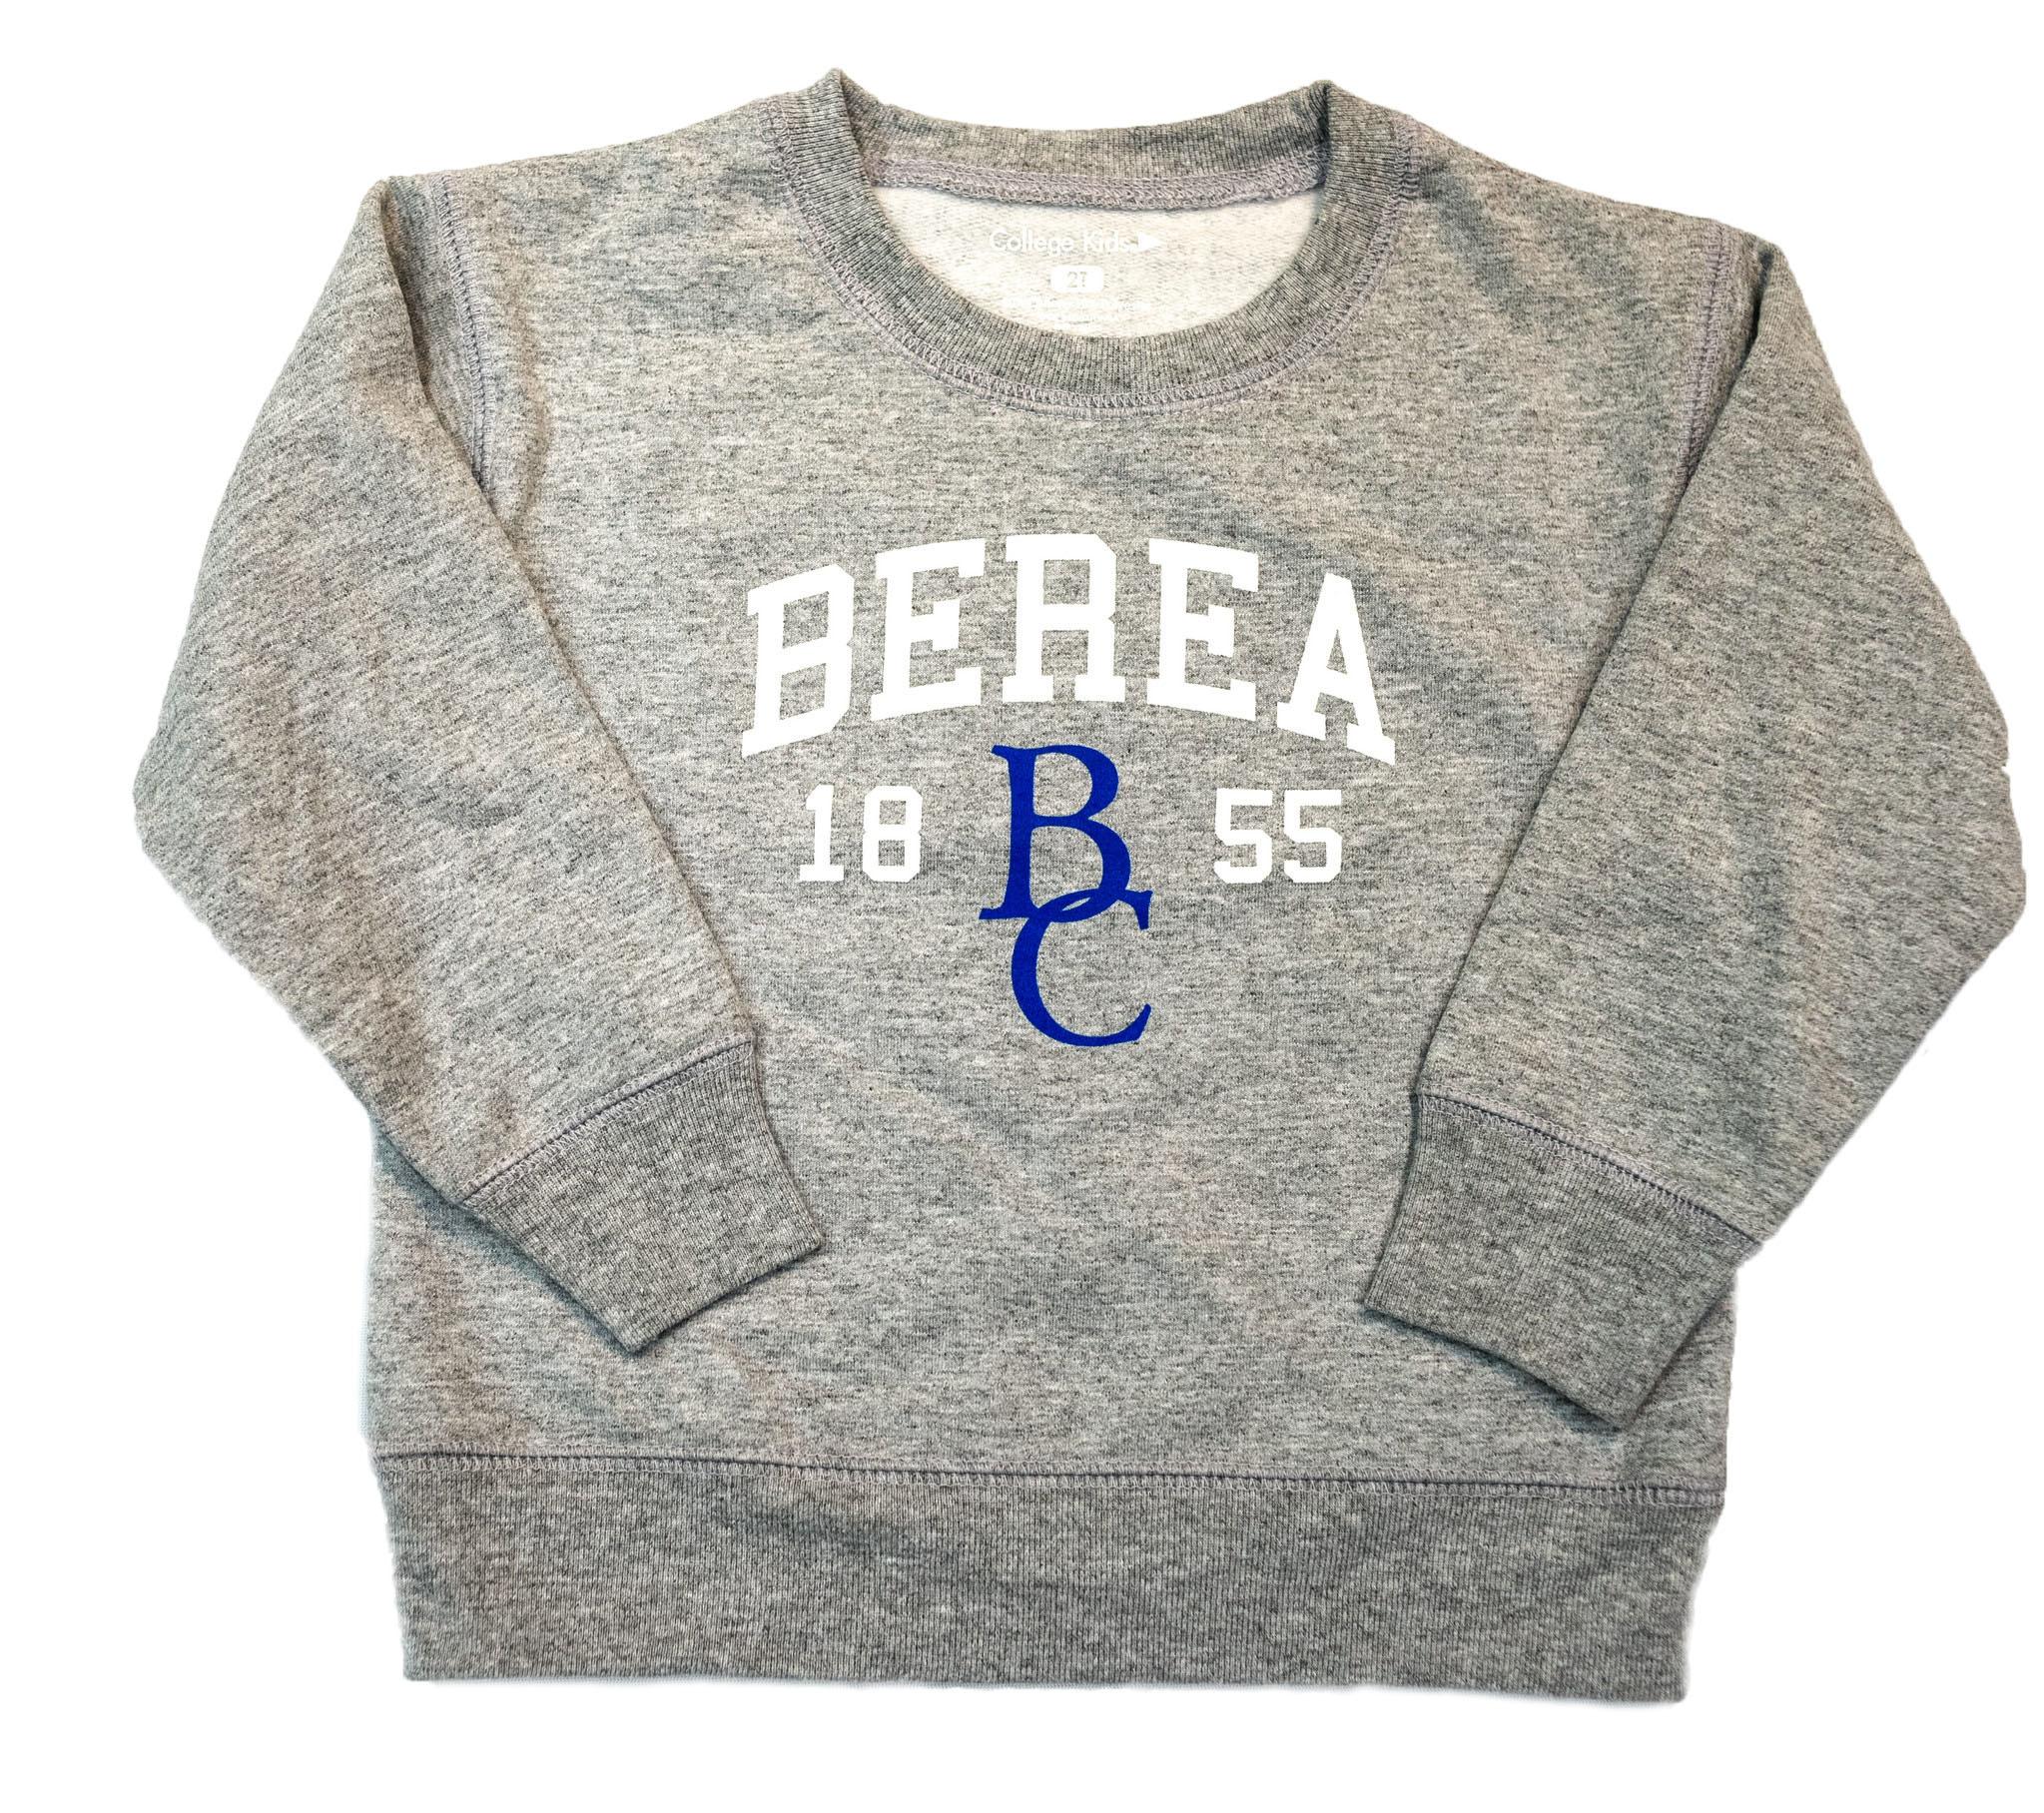 Pullover,Toddler,Gray,Berea